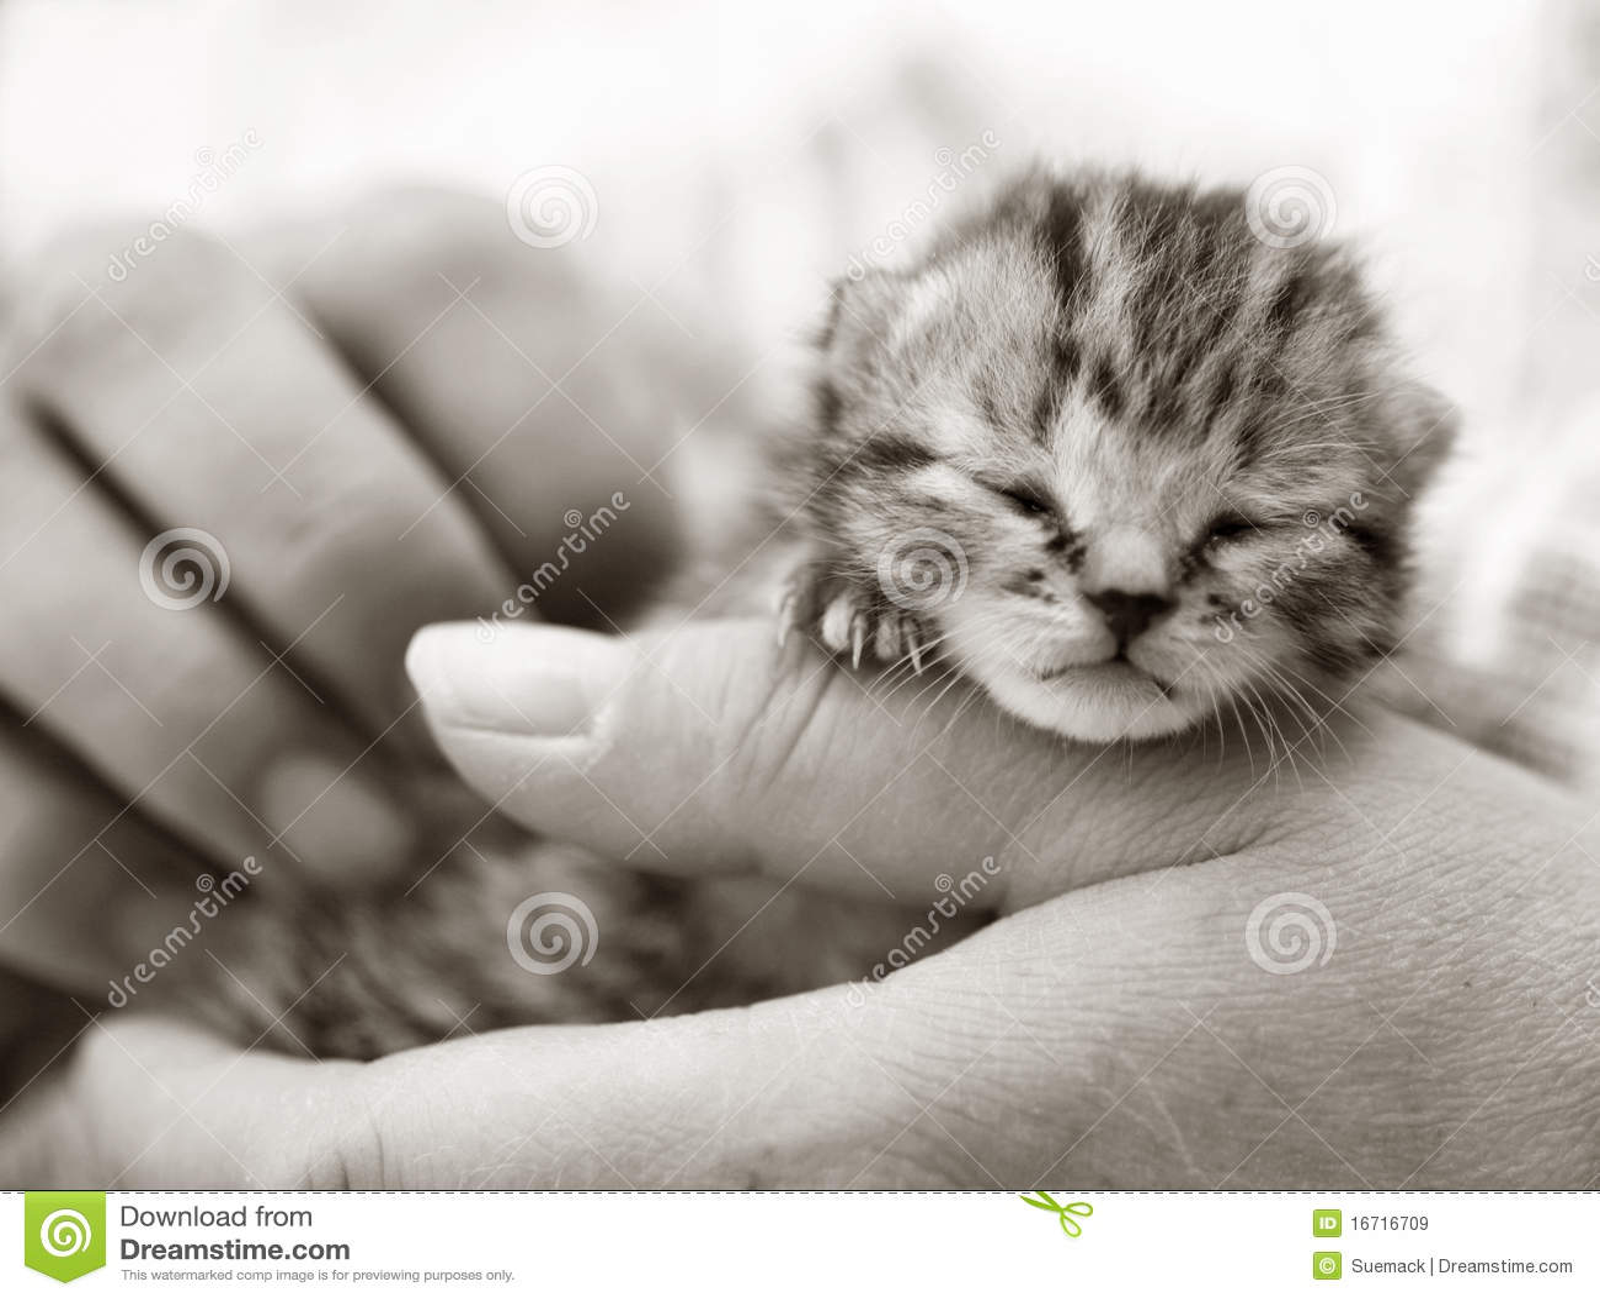 when to neuter a male kitten